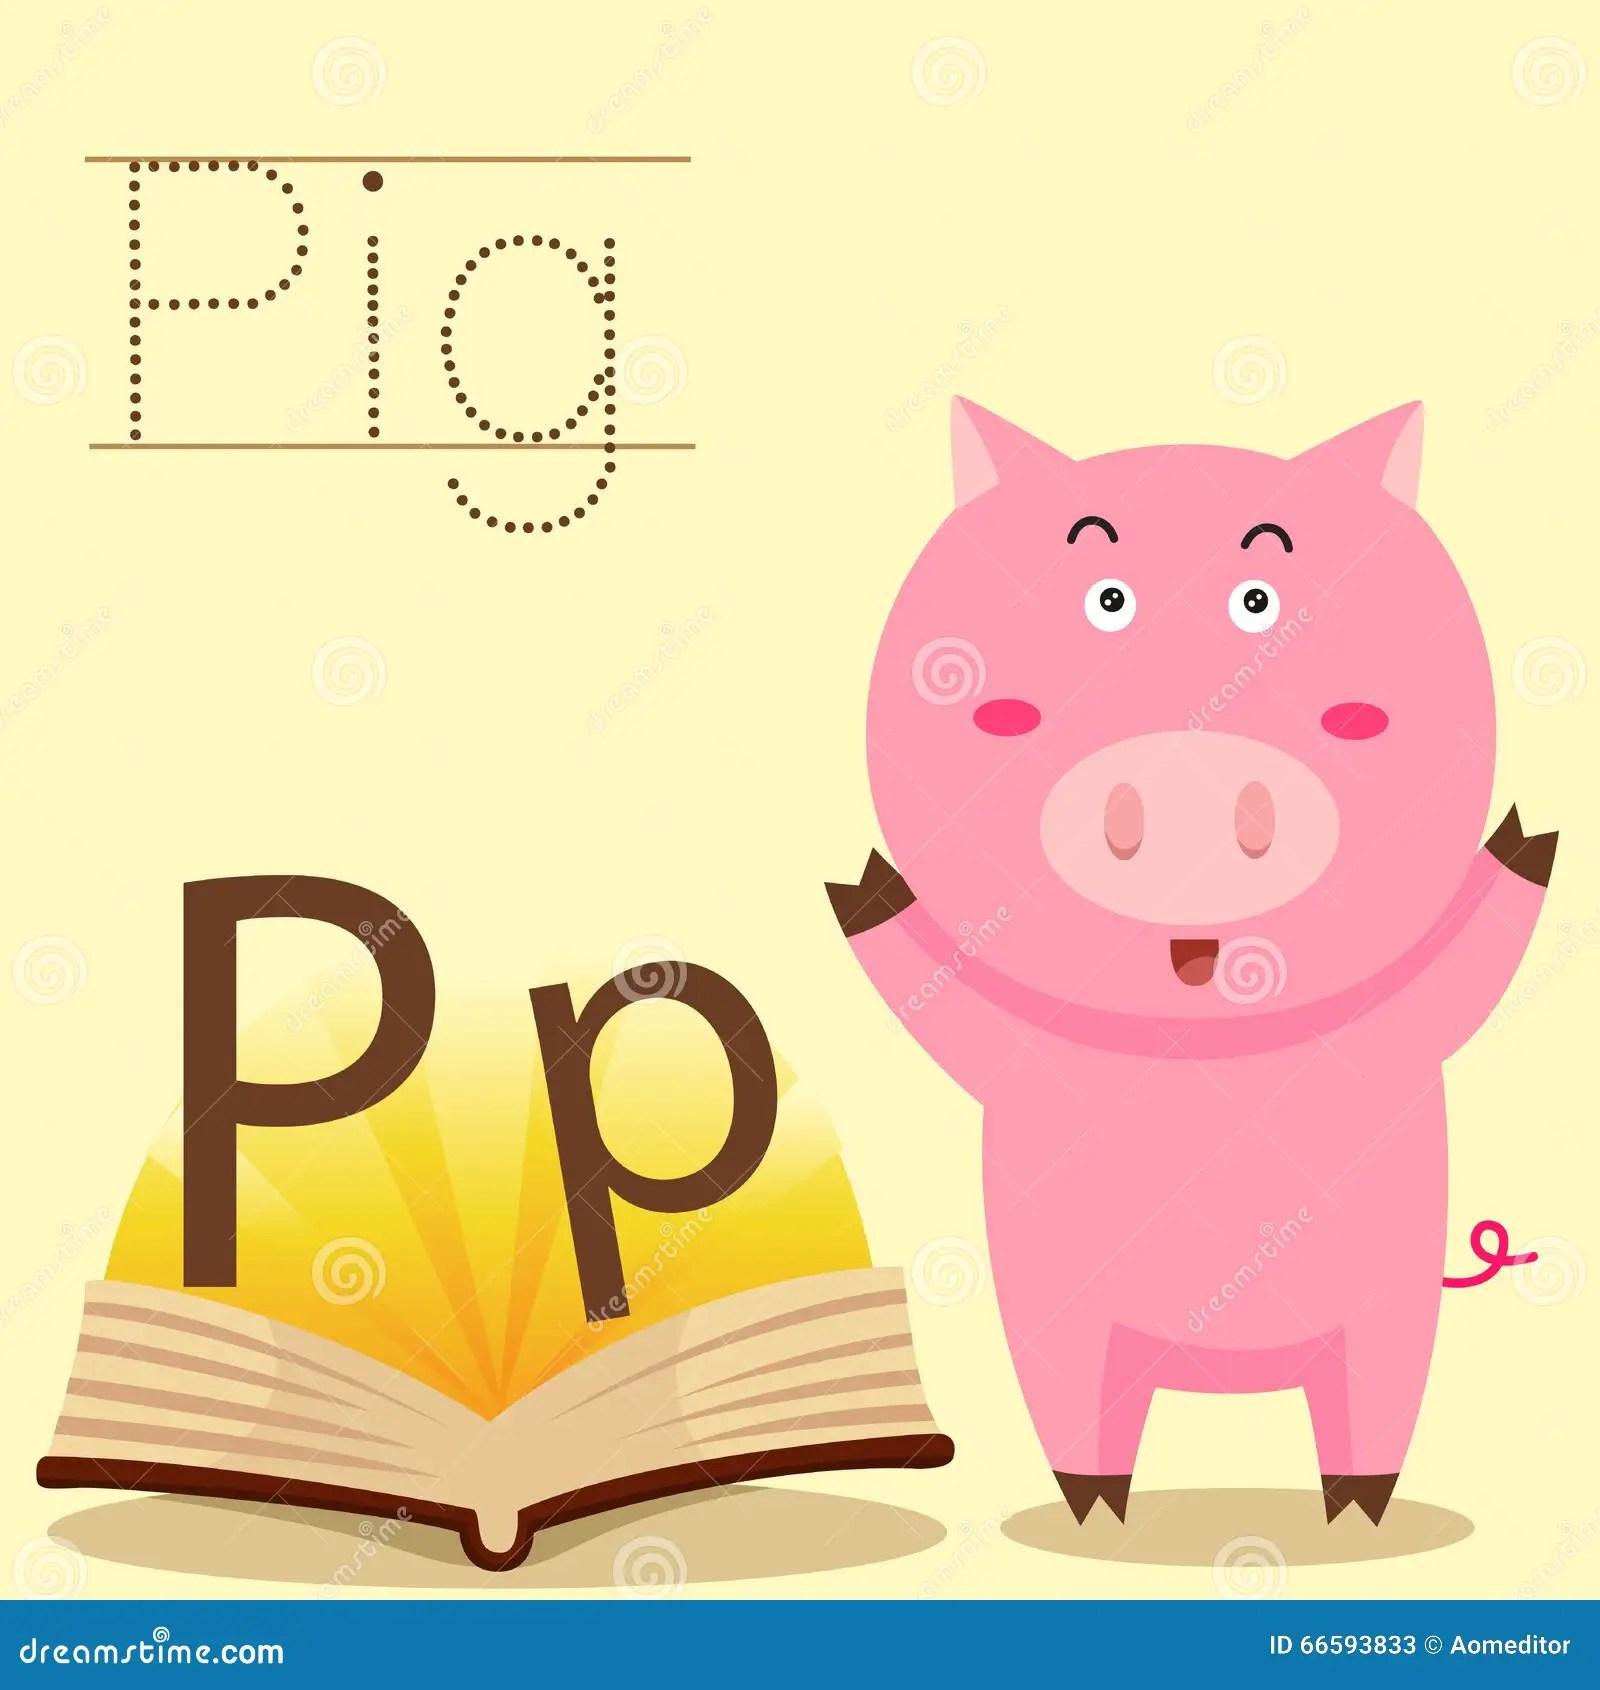 Illustrator Of P For Pig Vocabulary Stock Illustration